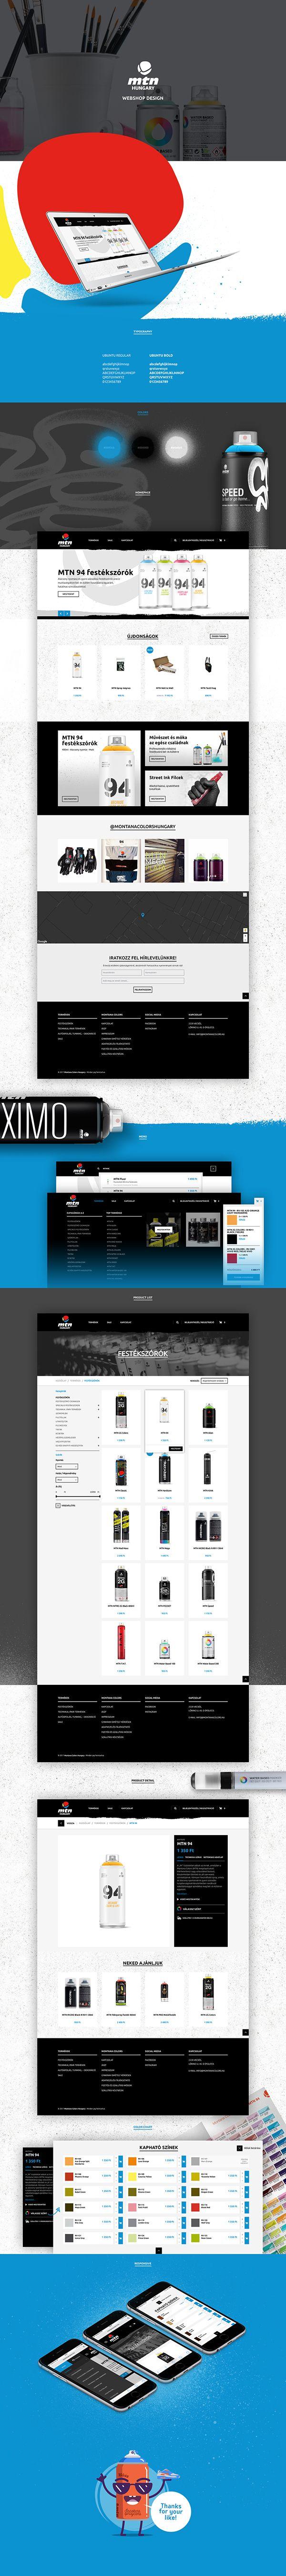 Montana Colors webshop design by Peter Magyar